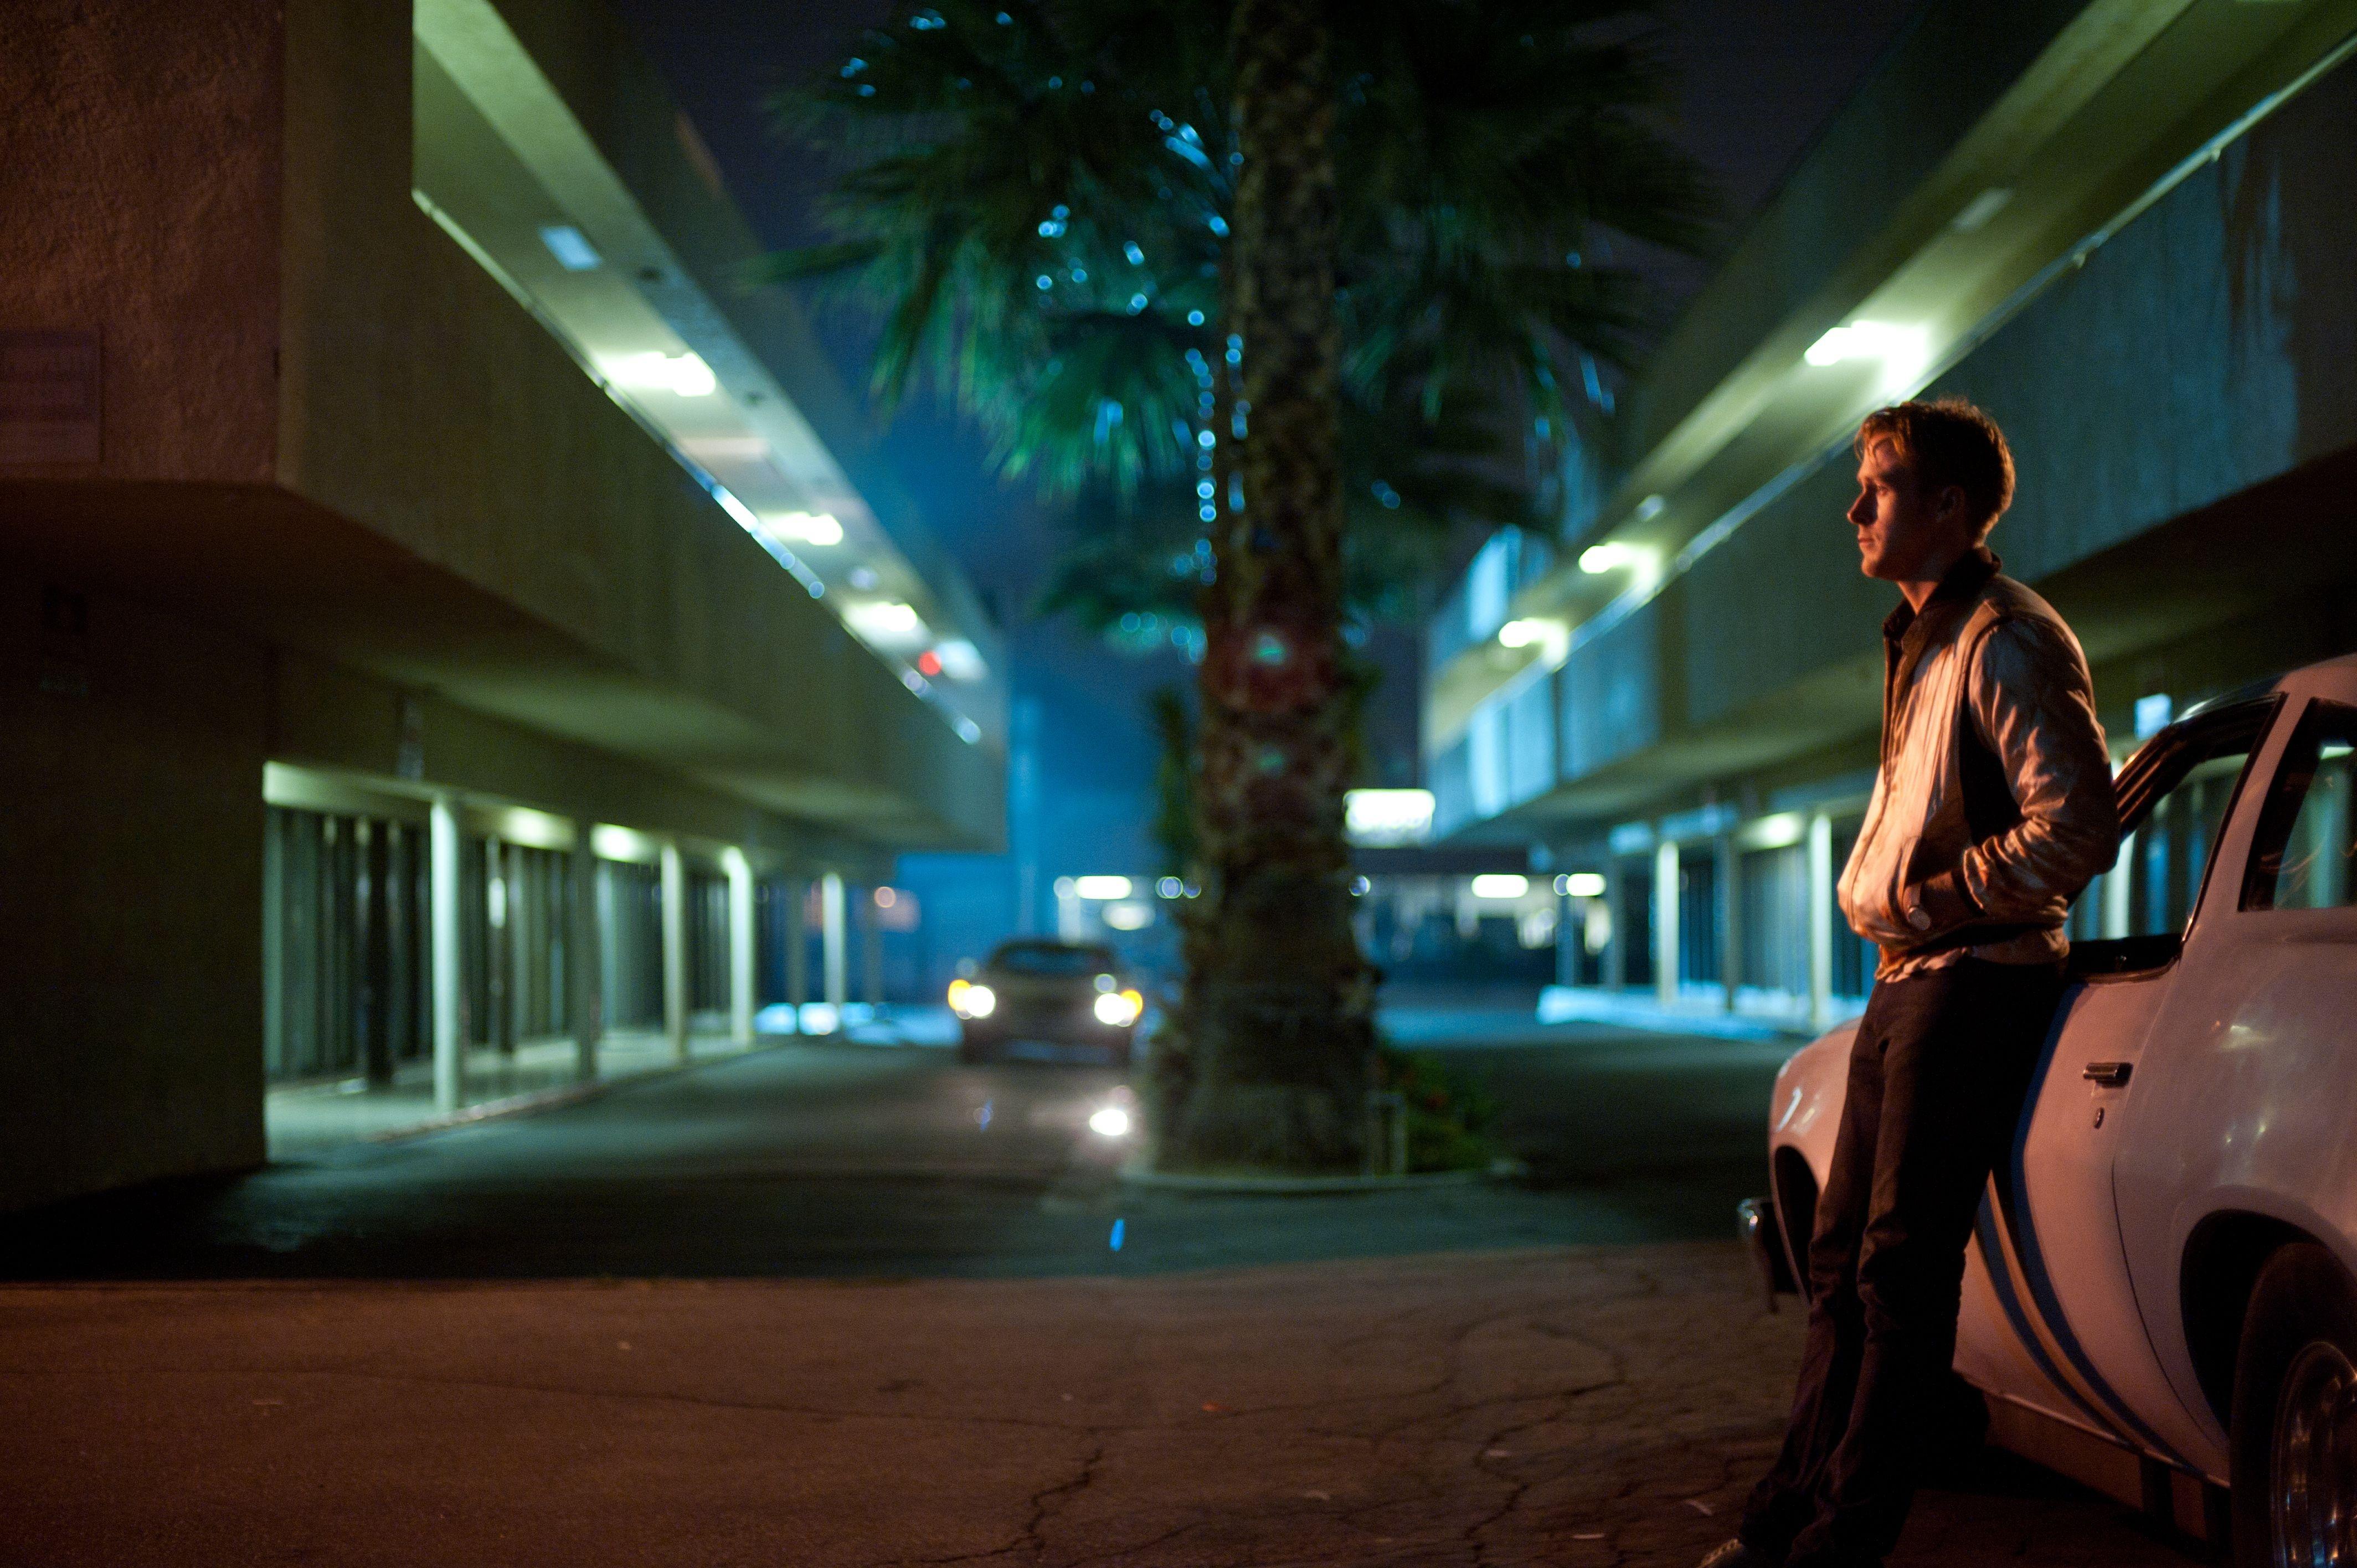 Good Evening Hd Wallpaper Wallpaper Night Movies Evening Ryan Gosling Drive